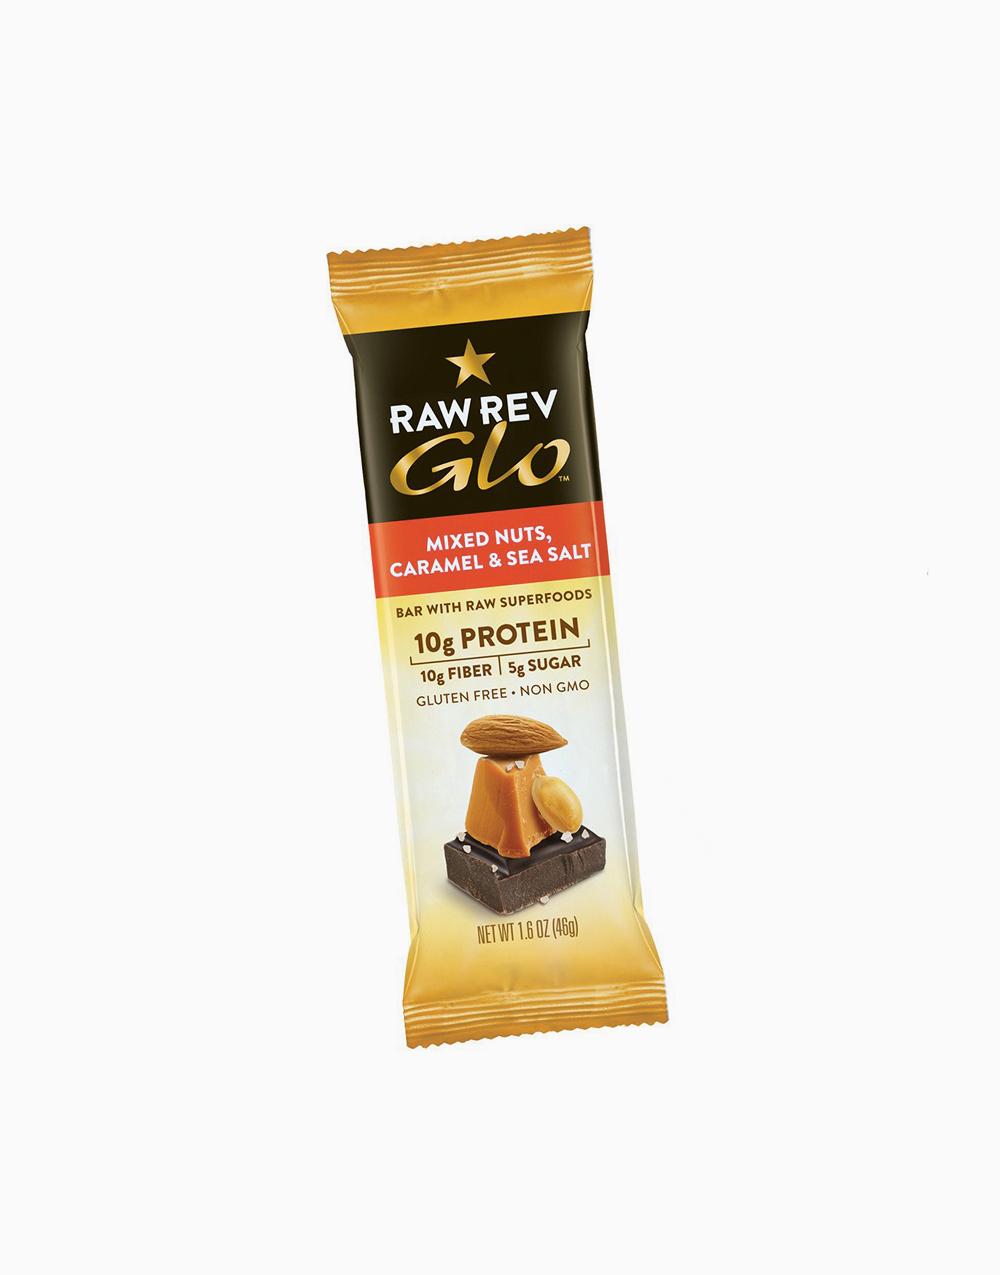 Mixed Nuts Caramel & Sea Salt (46g) by Raw Rev Glo